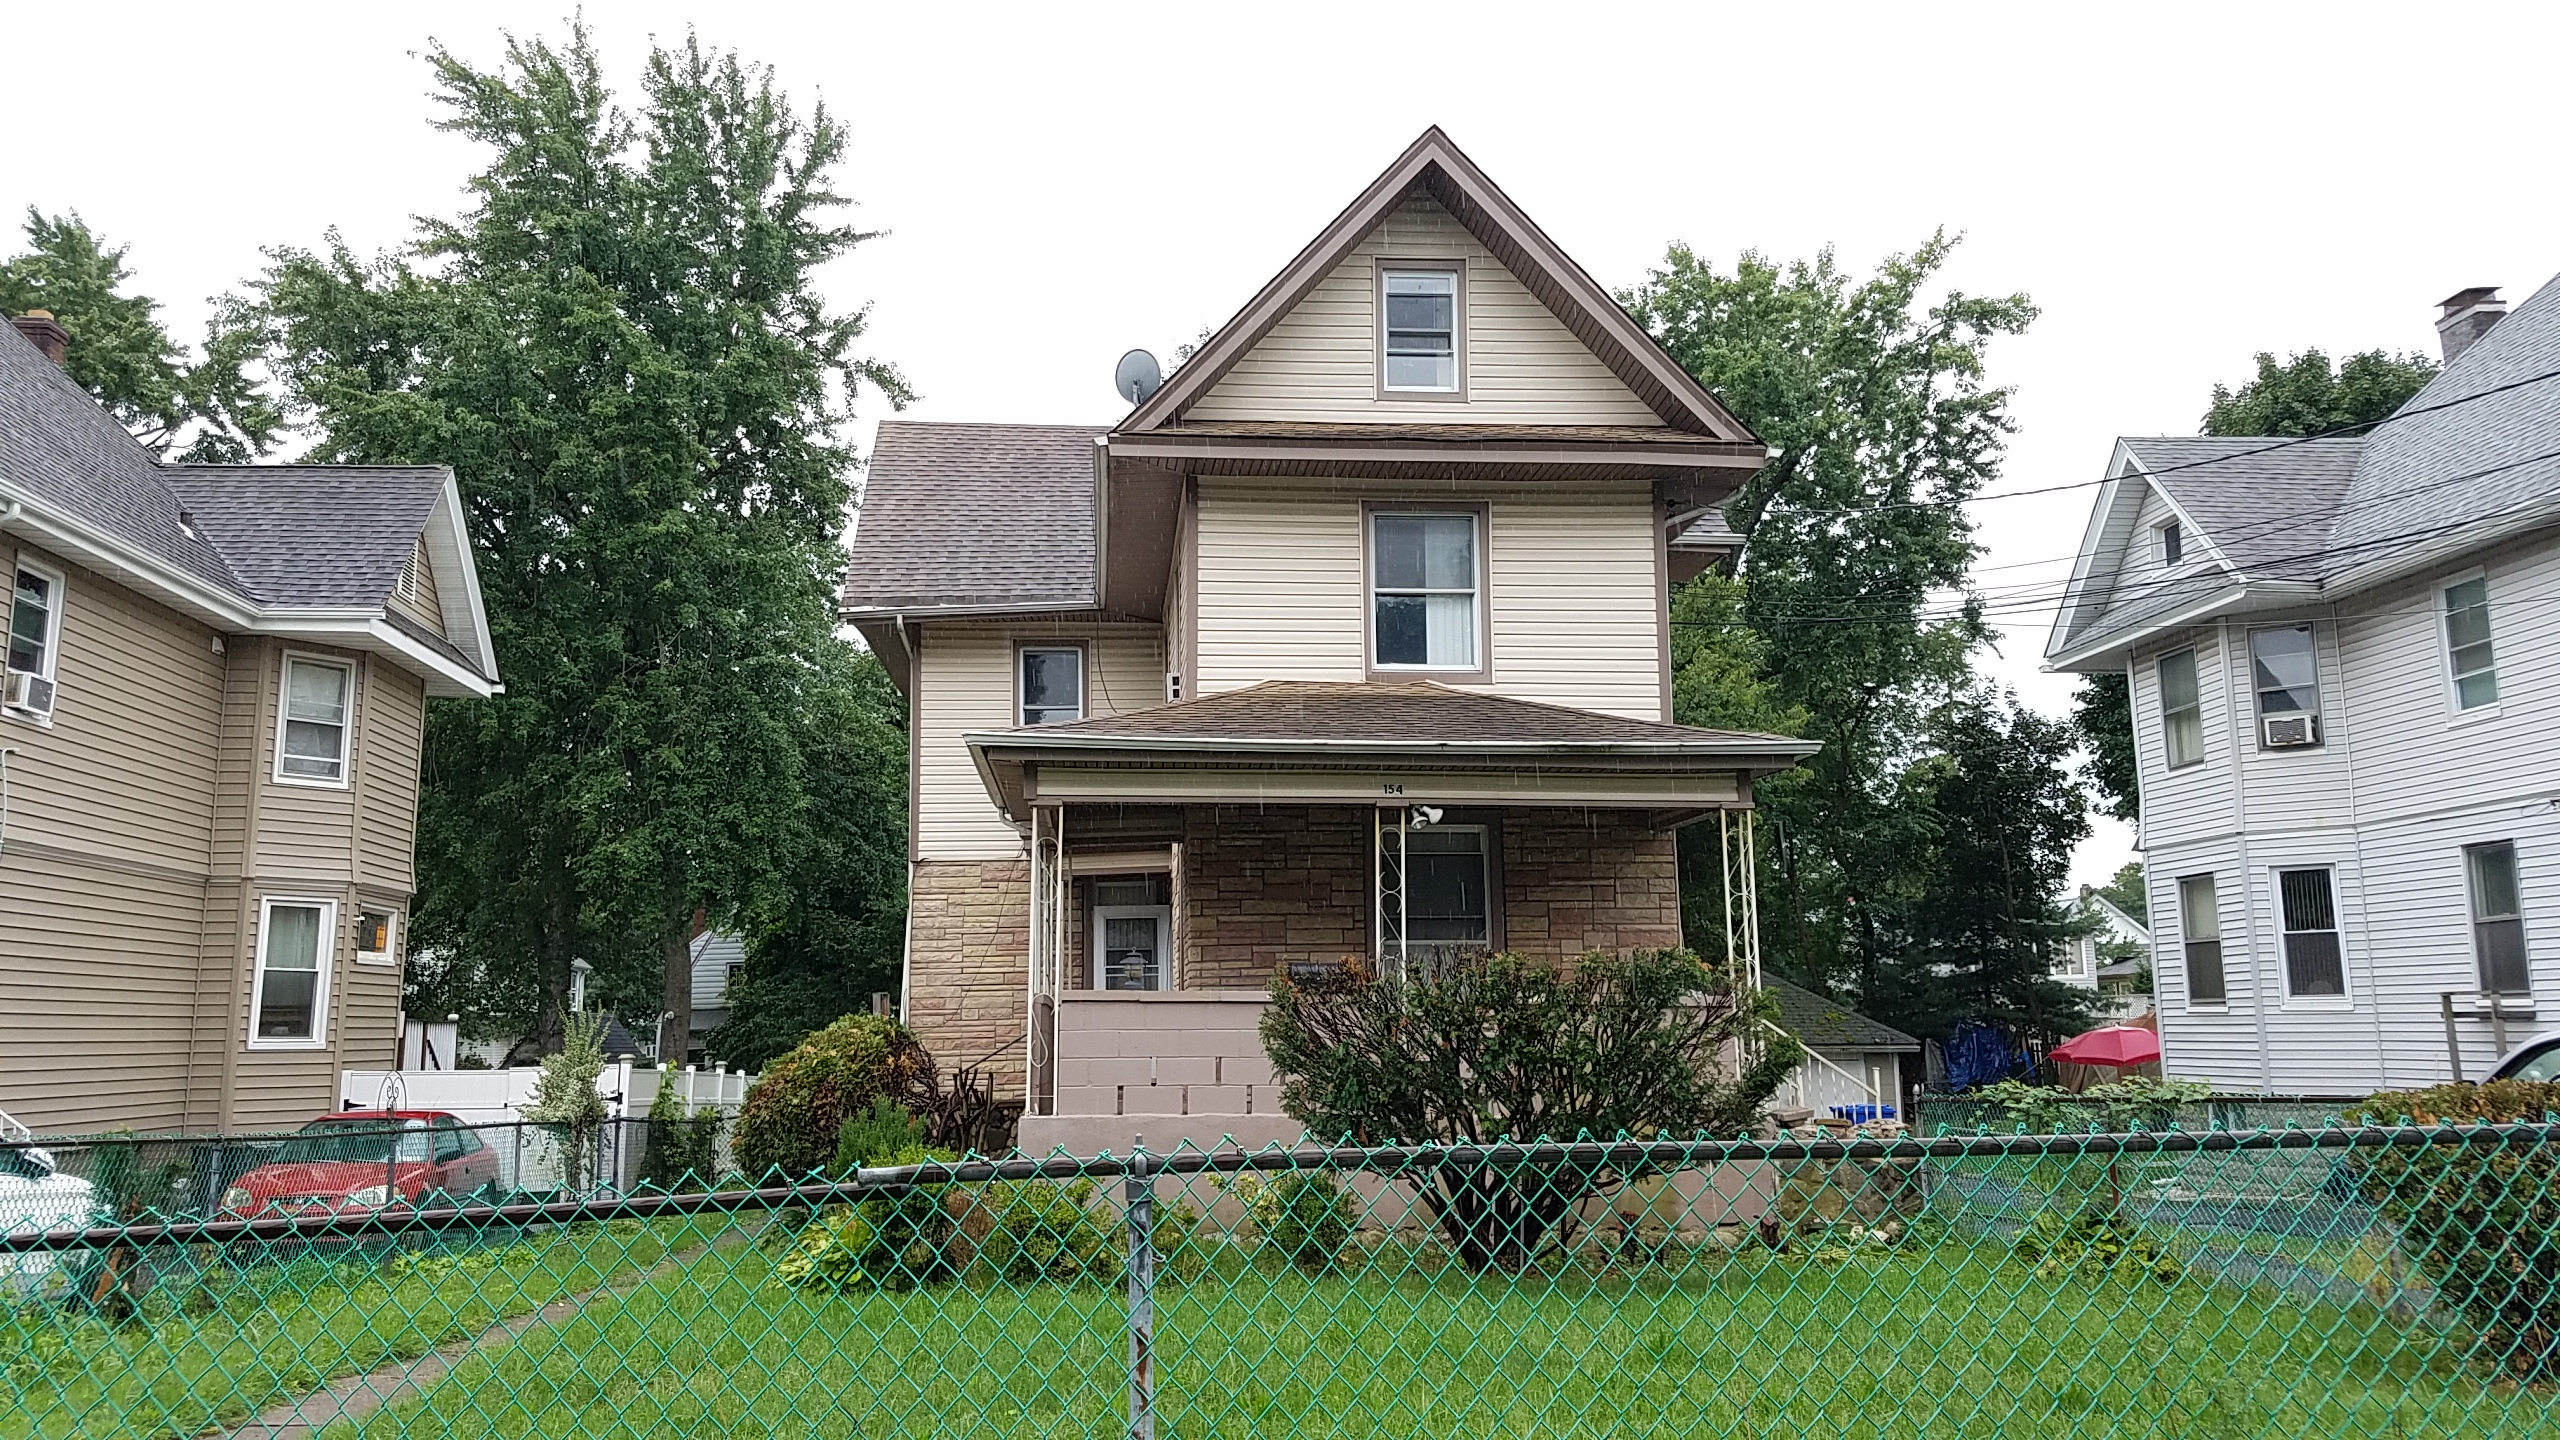 NEW REO – 154 MORSE PLACE, ENGLEWOOD, NJ 07631 – $317,900